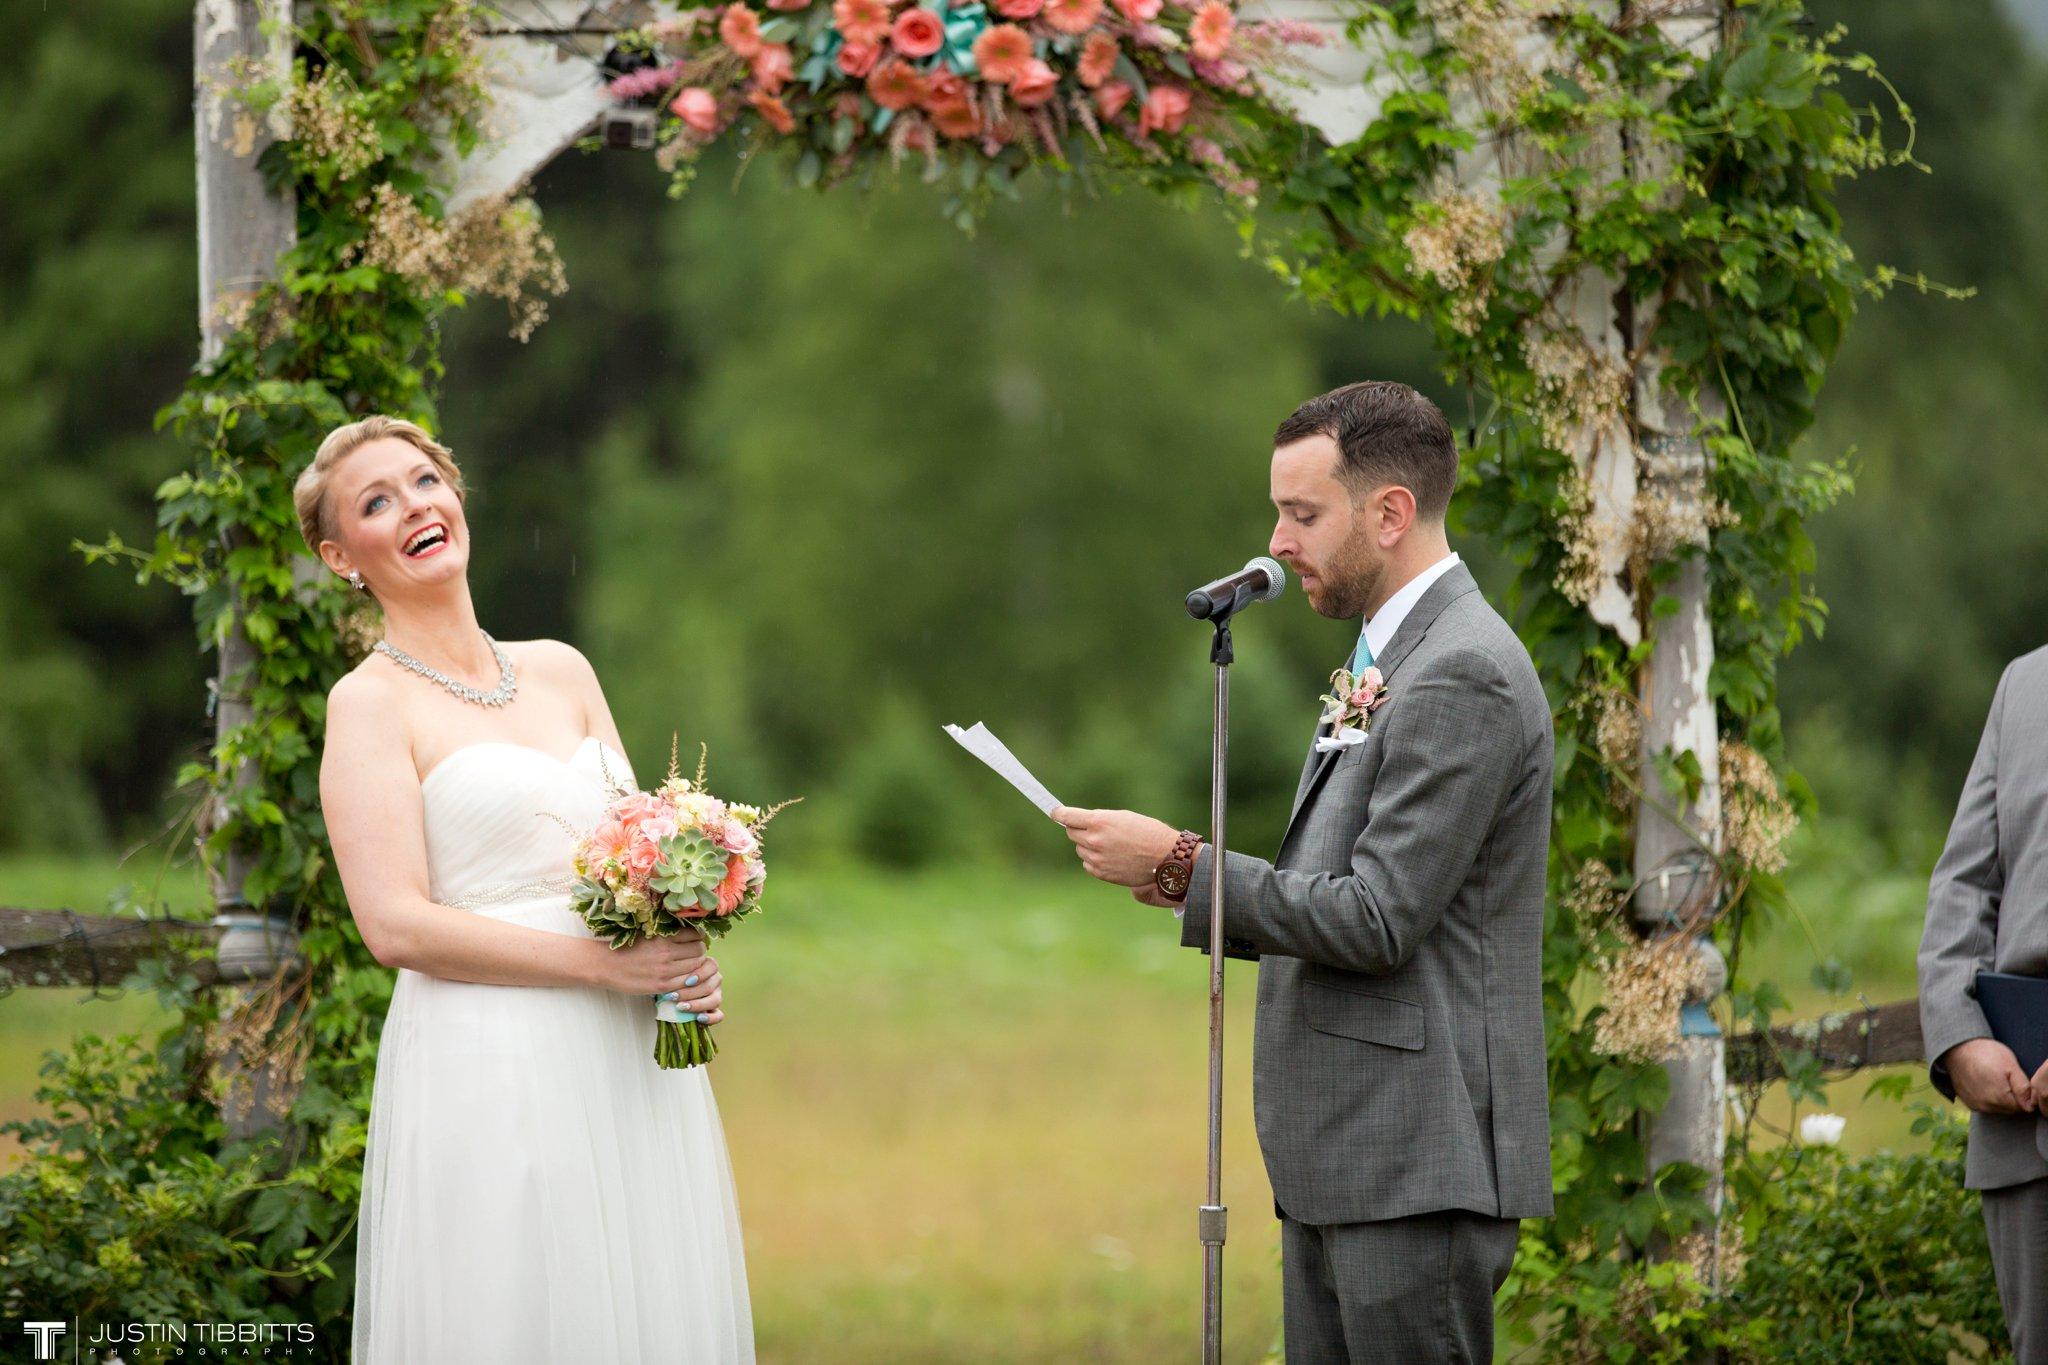 burlap-and-beams-wedding-photos-with-joran-and-molly_0069